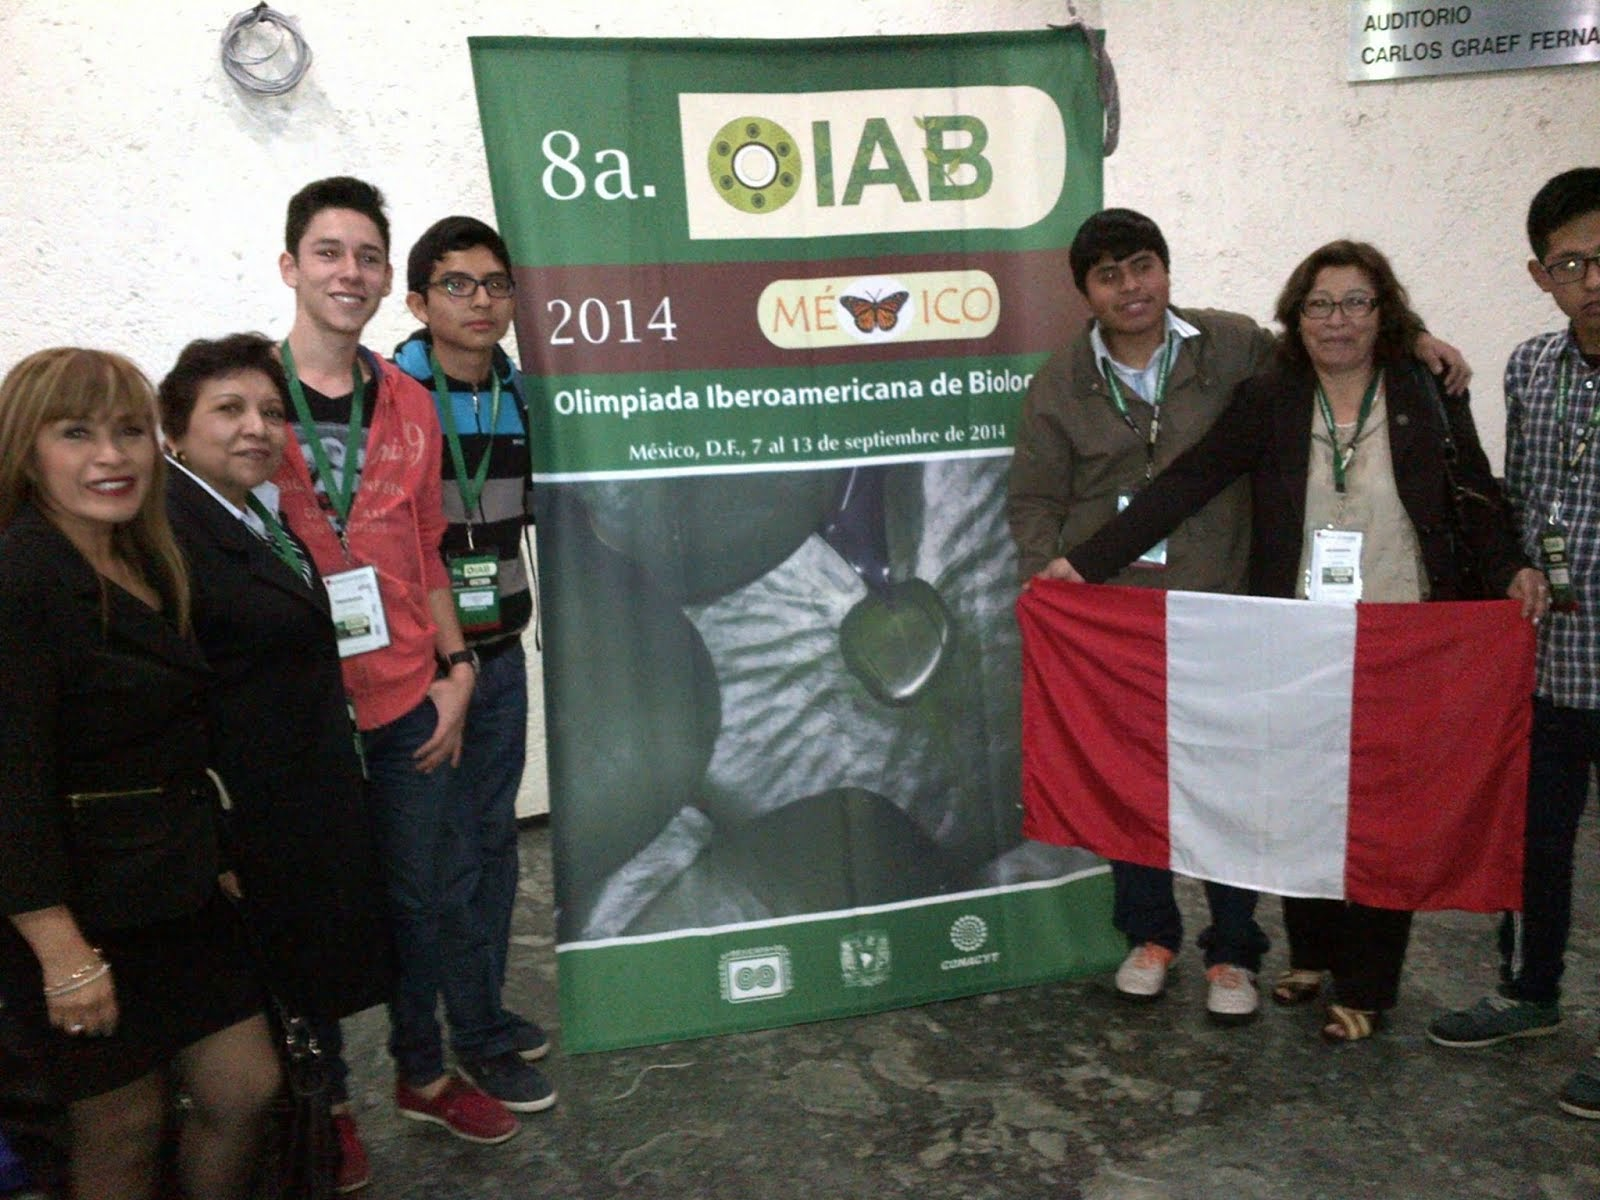 OCTAVA OLIMPIADA IBEROAMERICANA DE BIOLOGIA OIAB MEXICO 2014